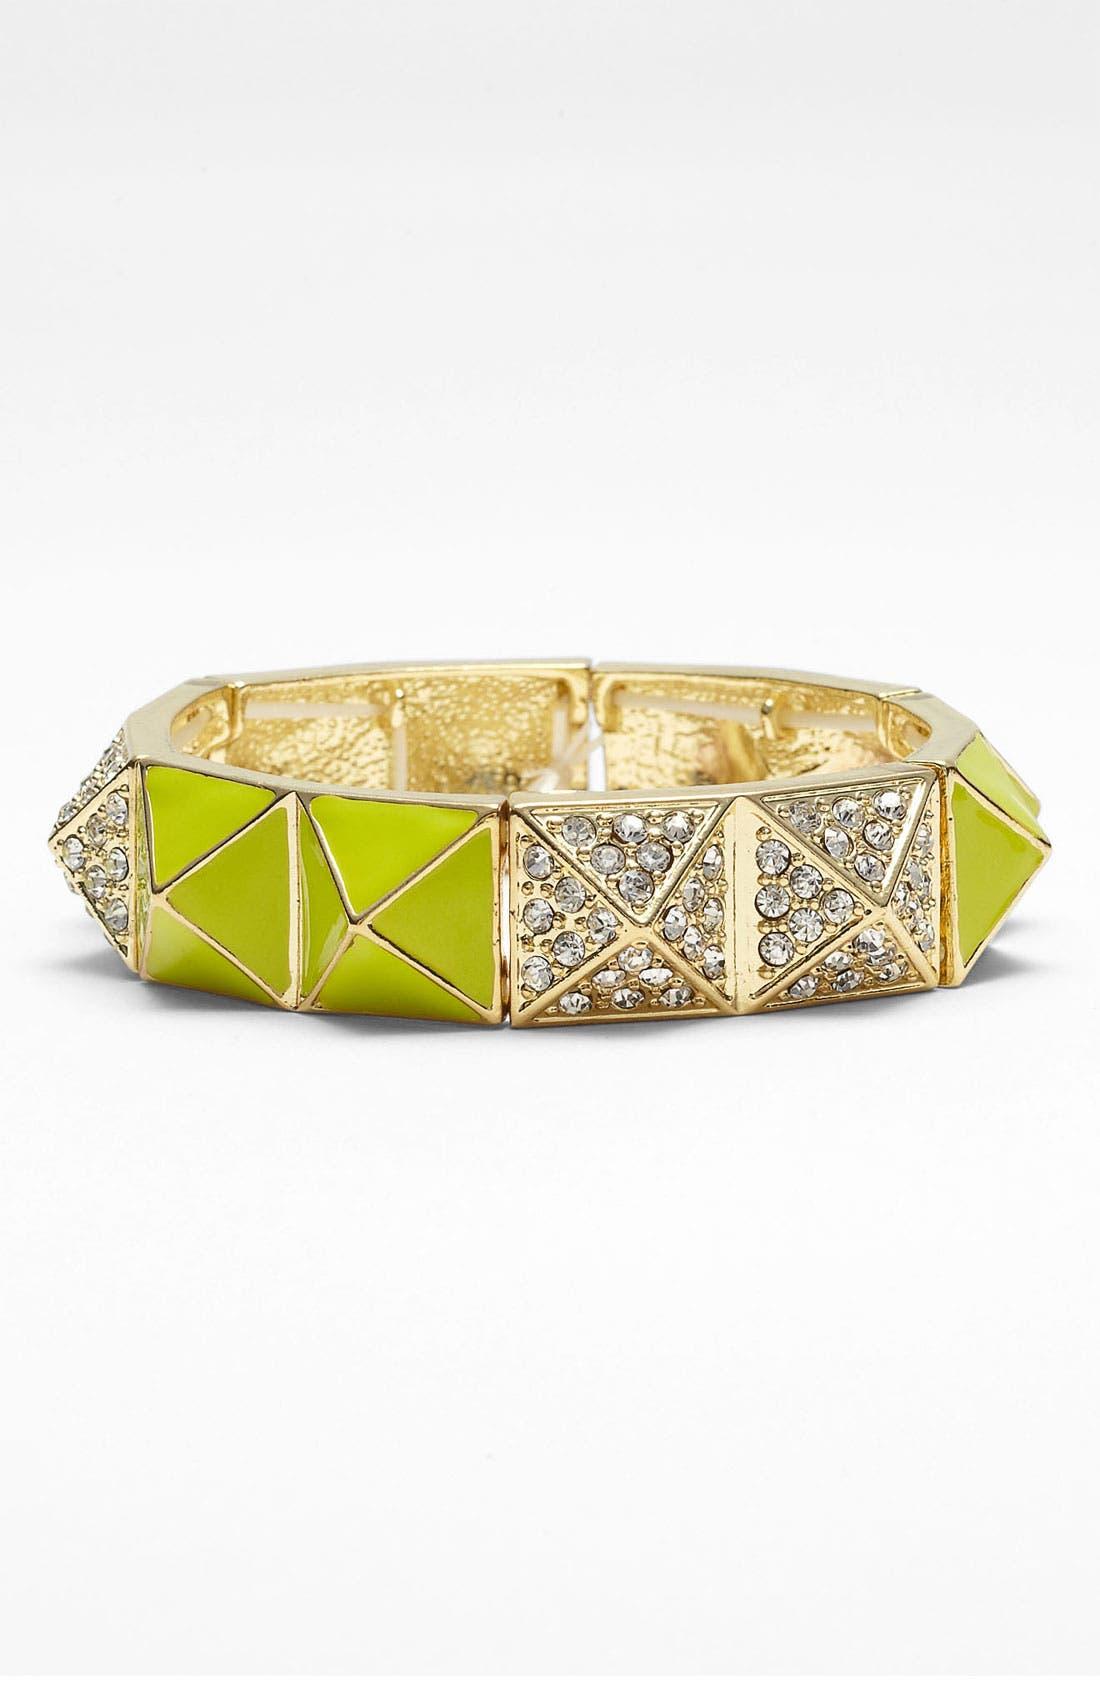 Main Image - Nadri Bangle & Cara Accessories Bracelets